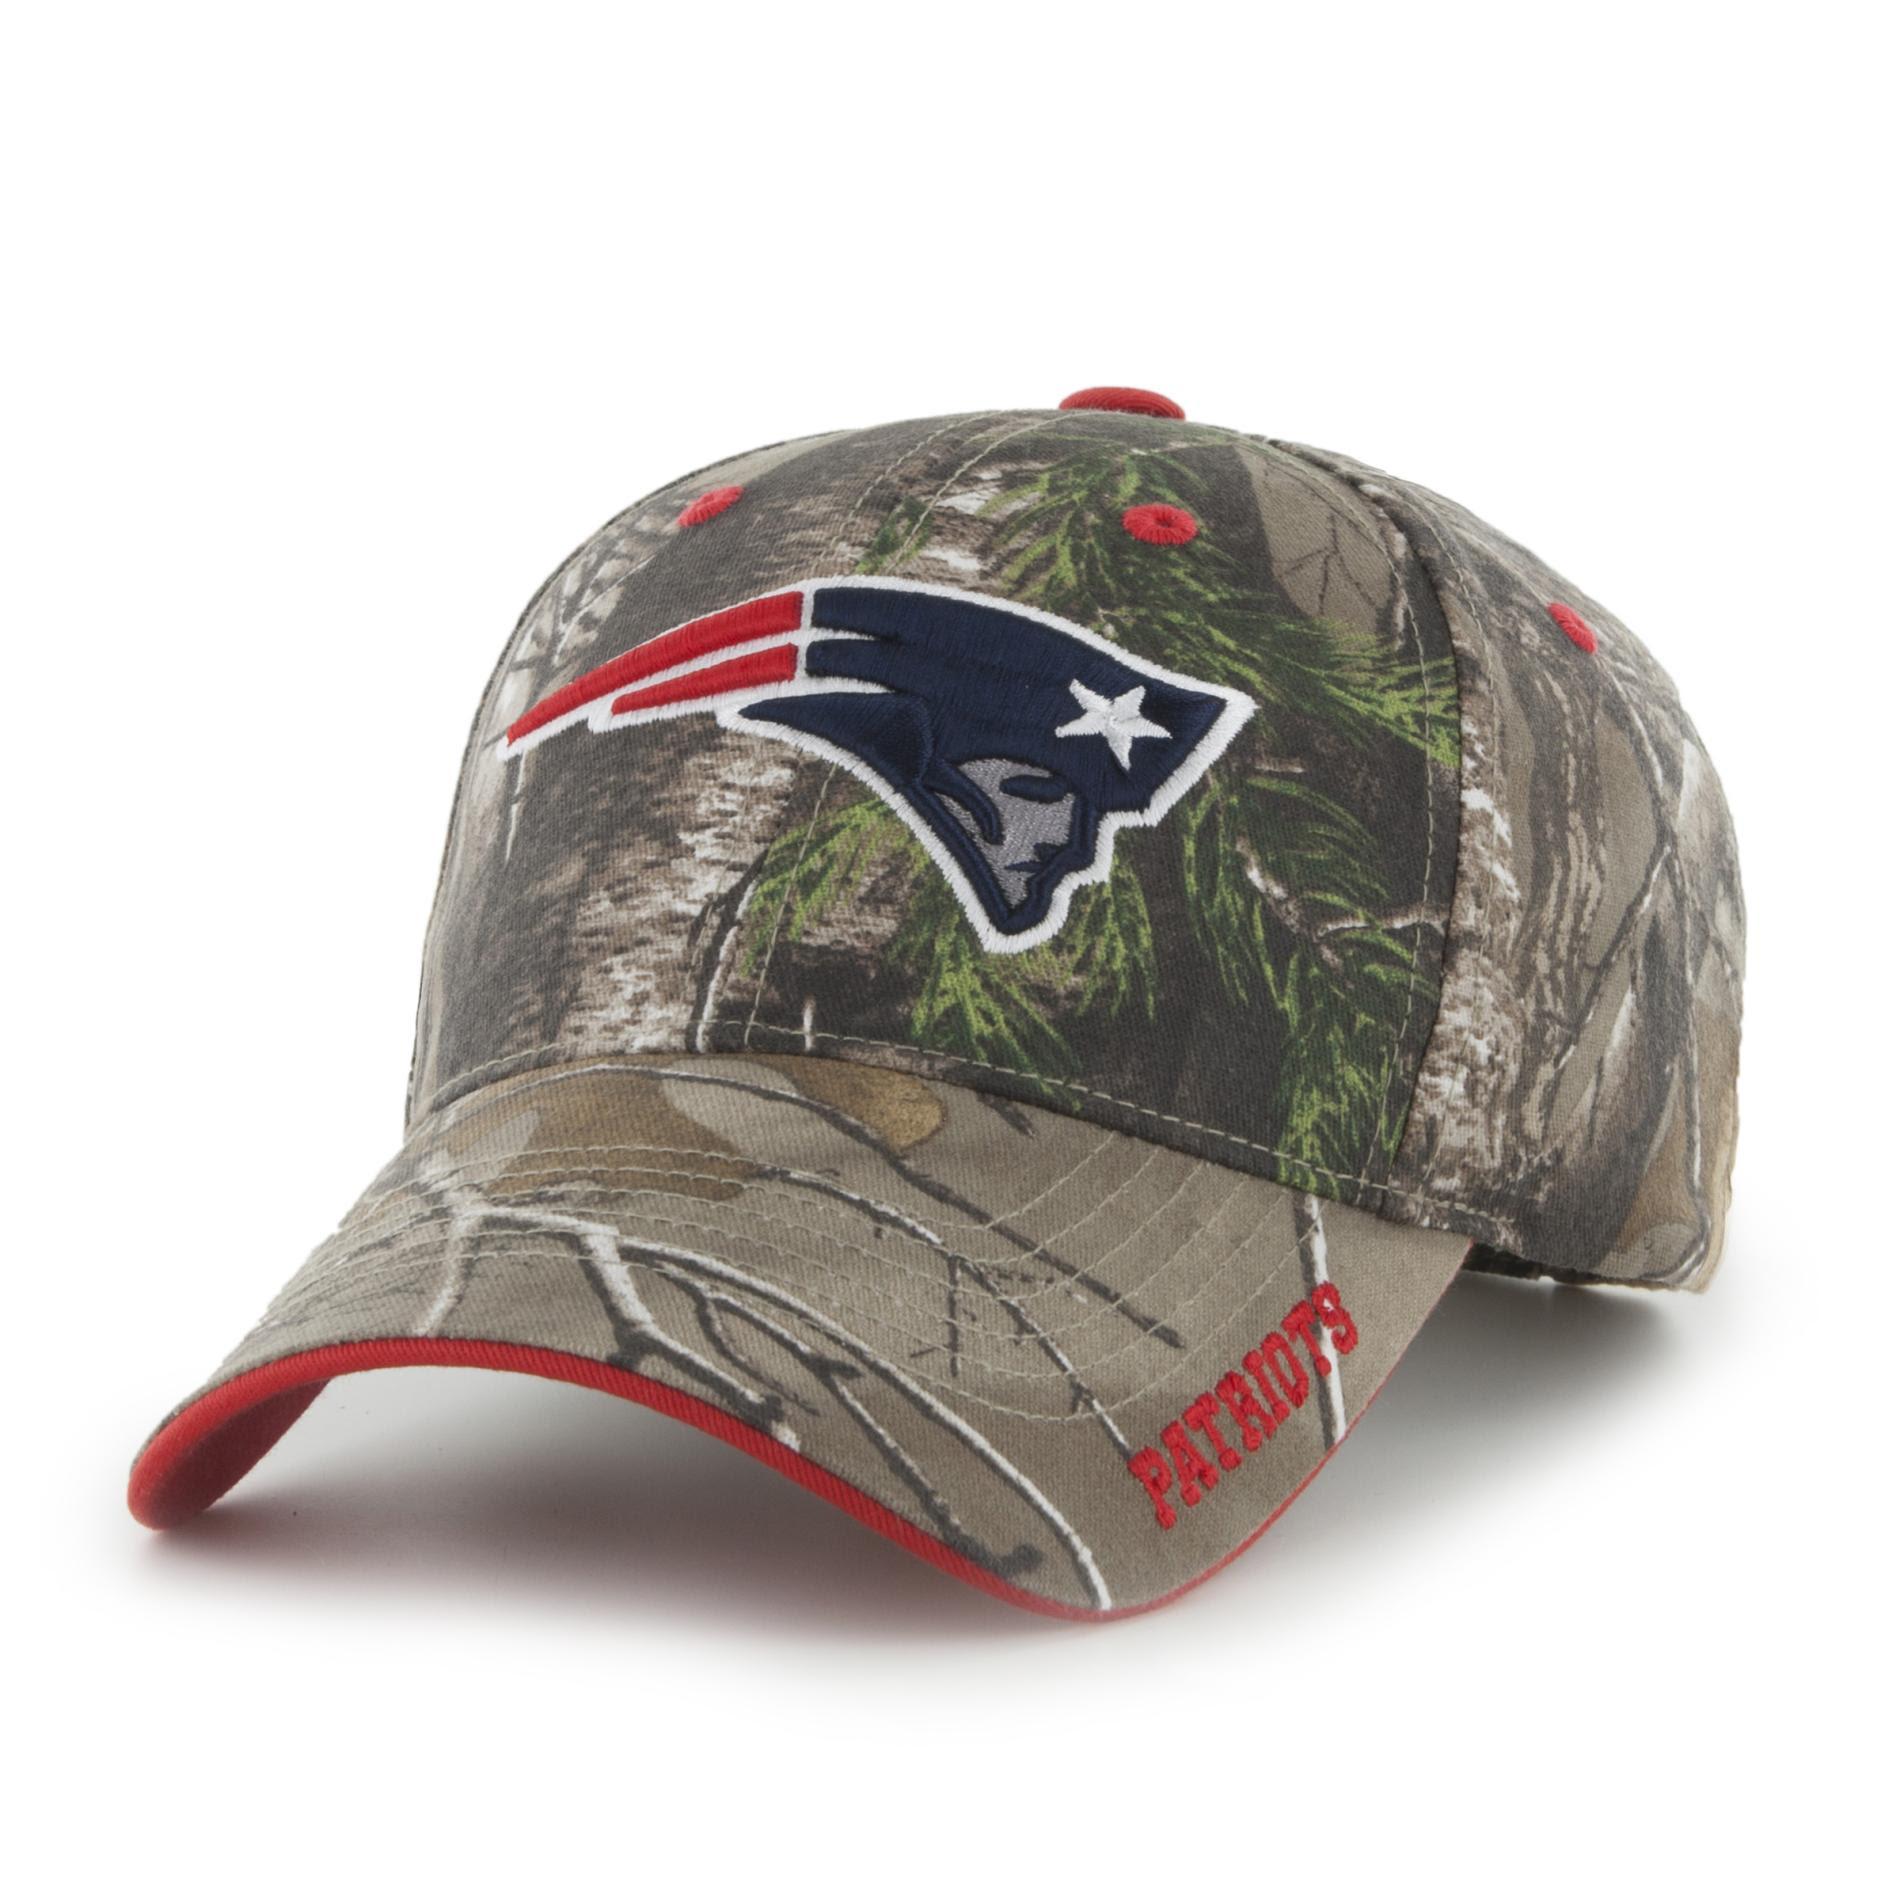 NFL Mens Camo Baseball Hat  New England Patriots